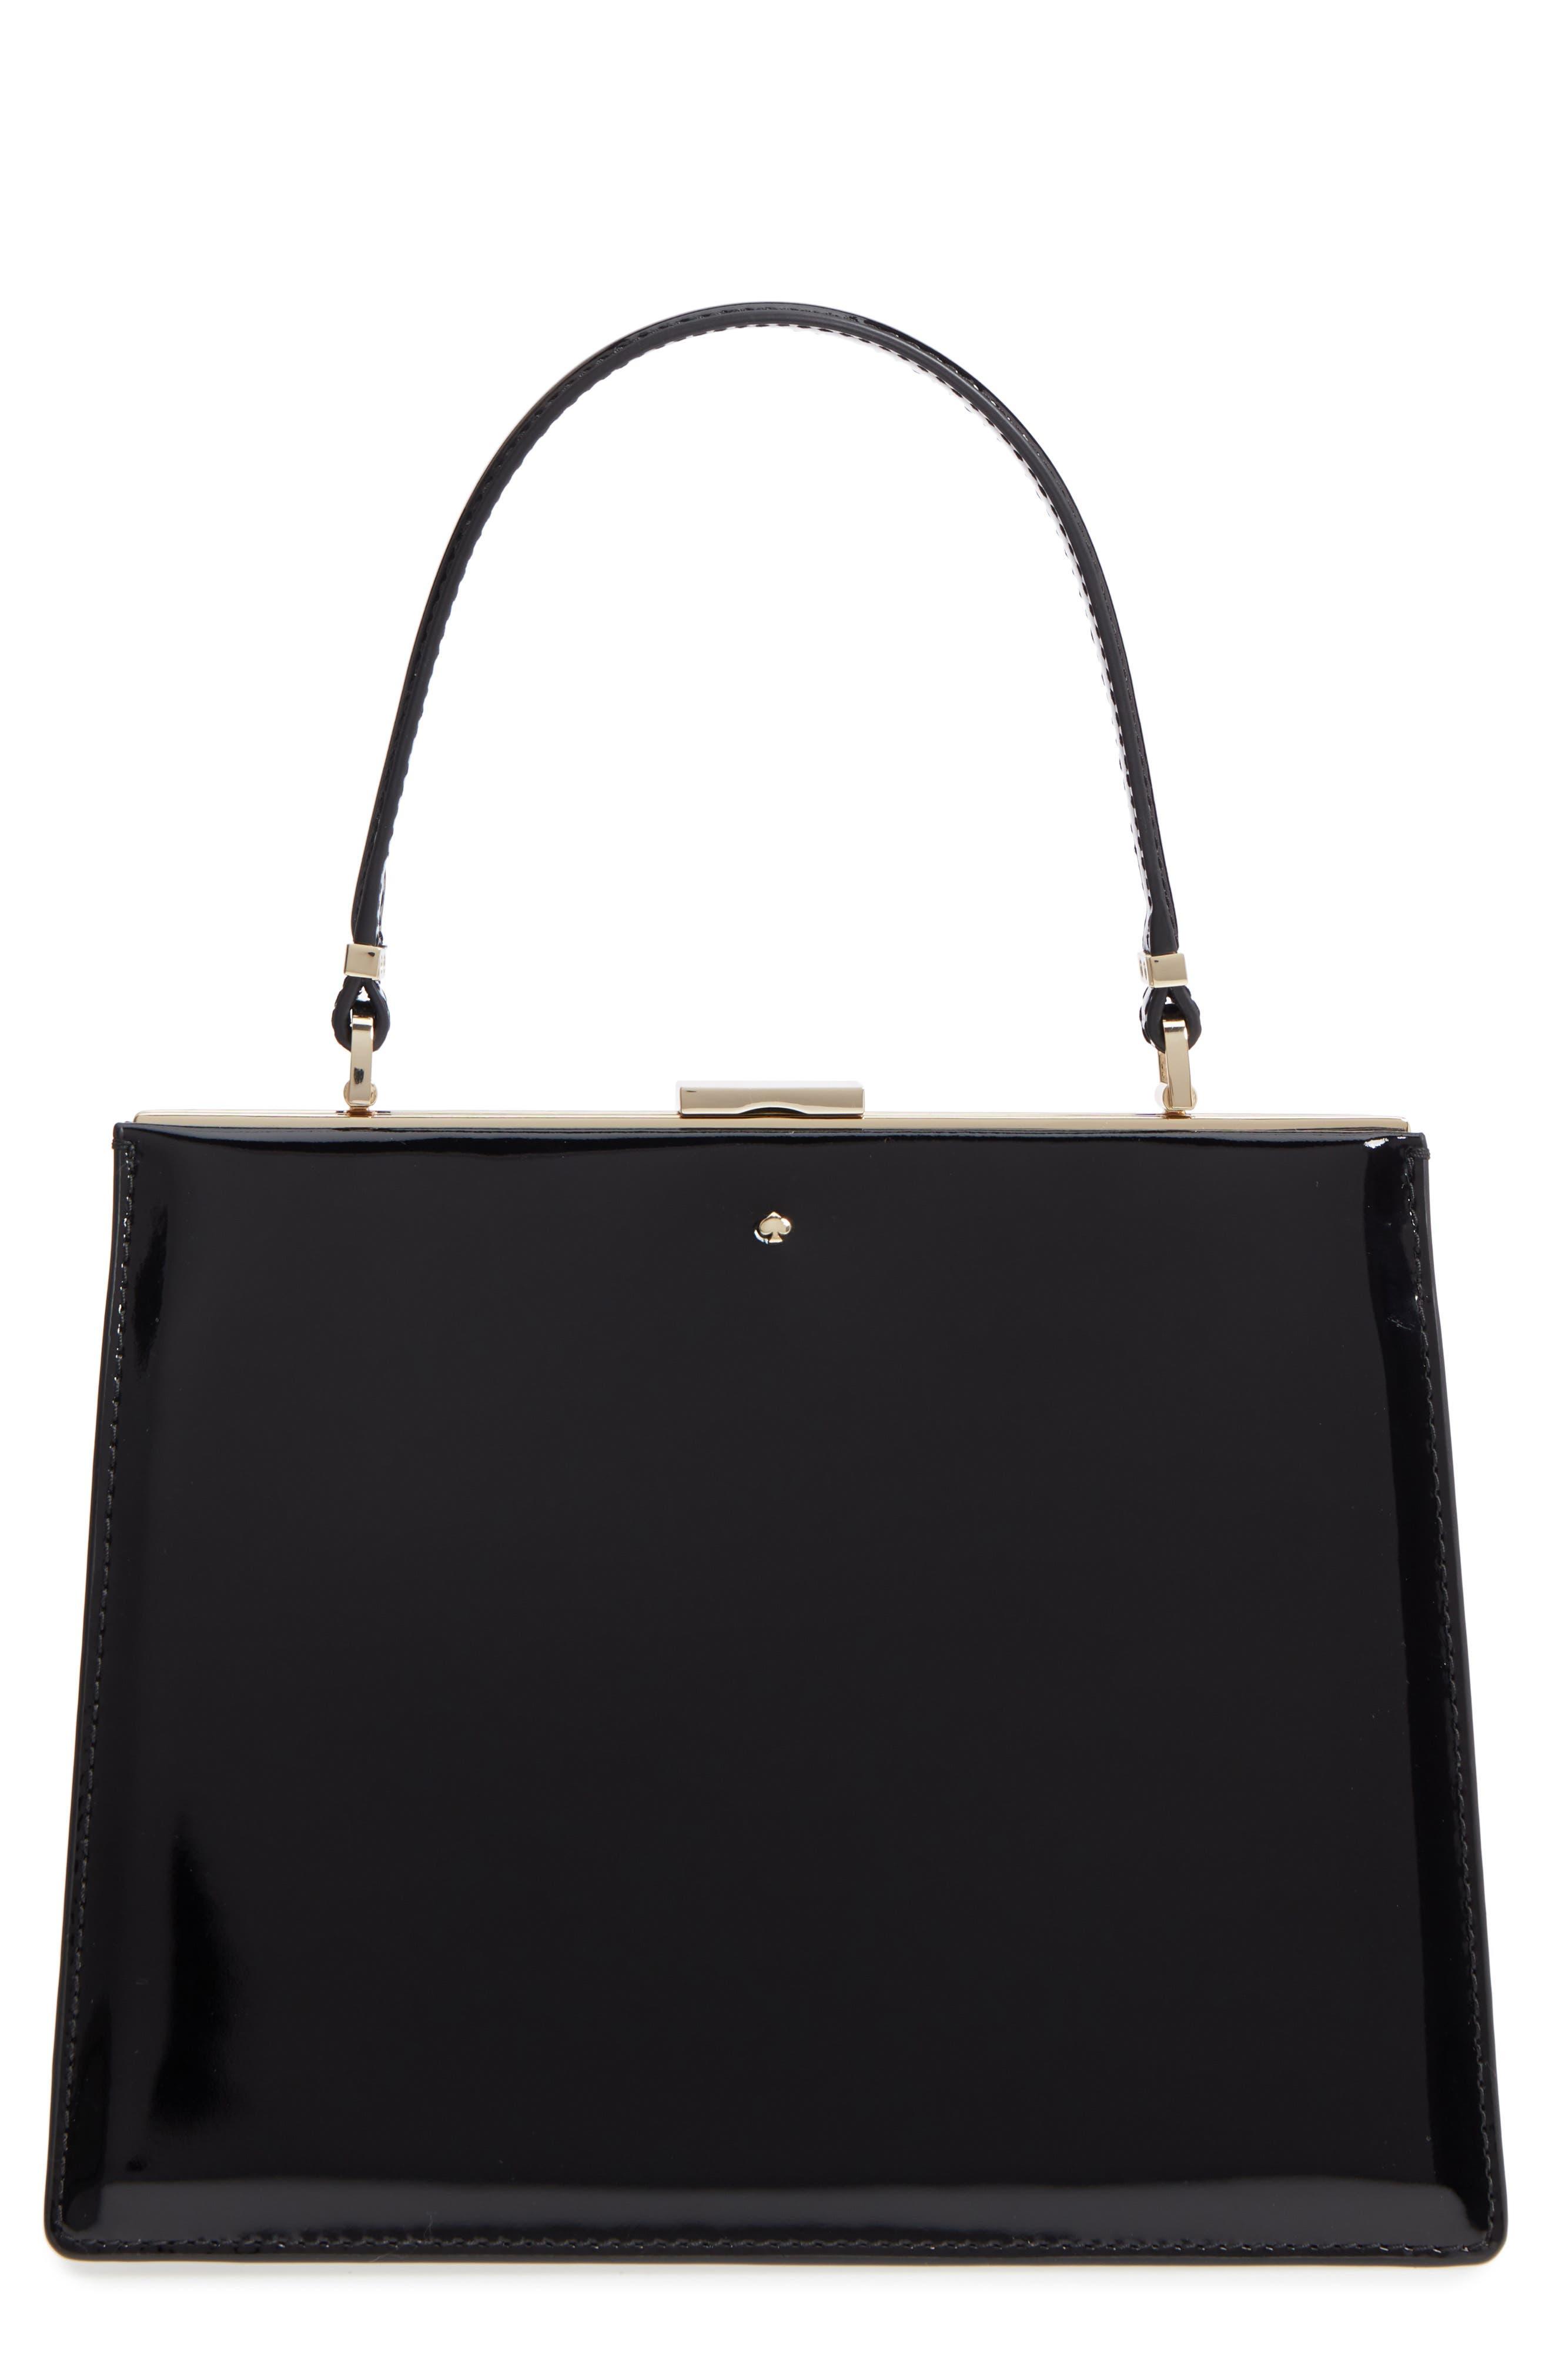 KATE SPADE NEW YORK madison moore road - chari leather handbag, Main, color, 001